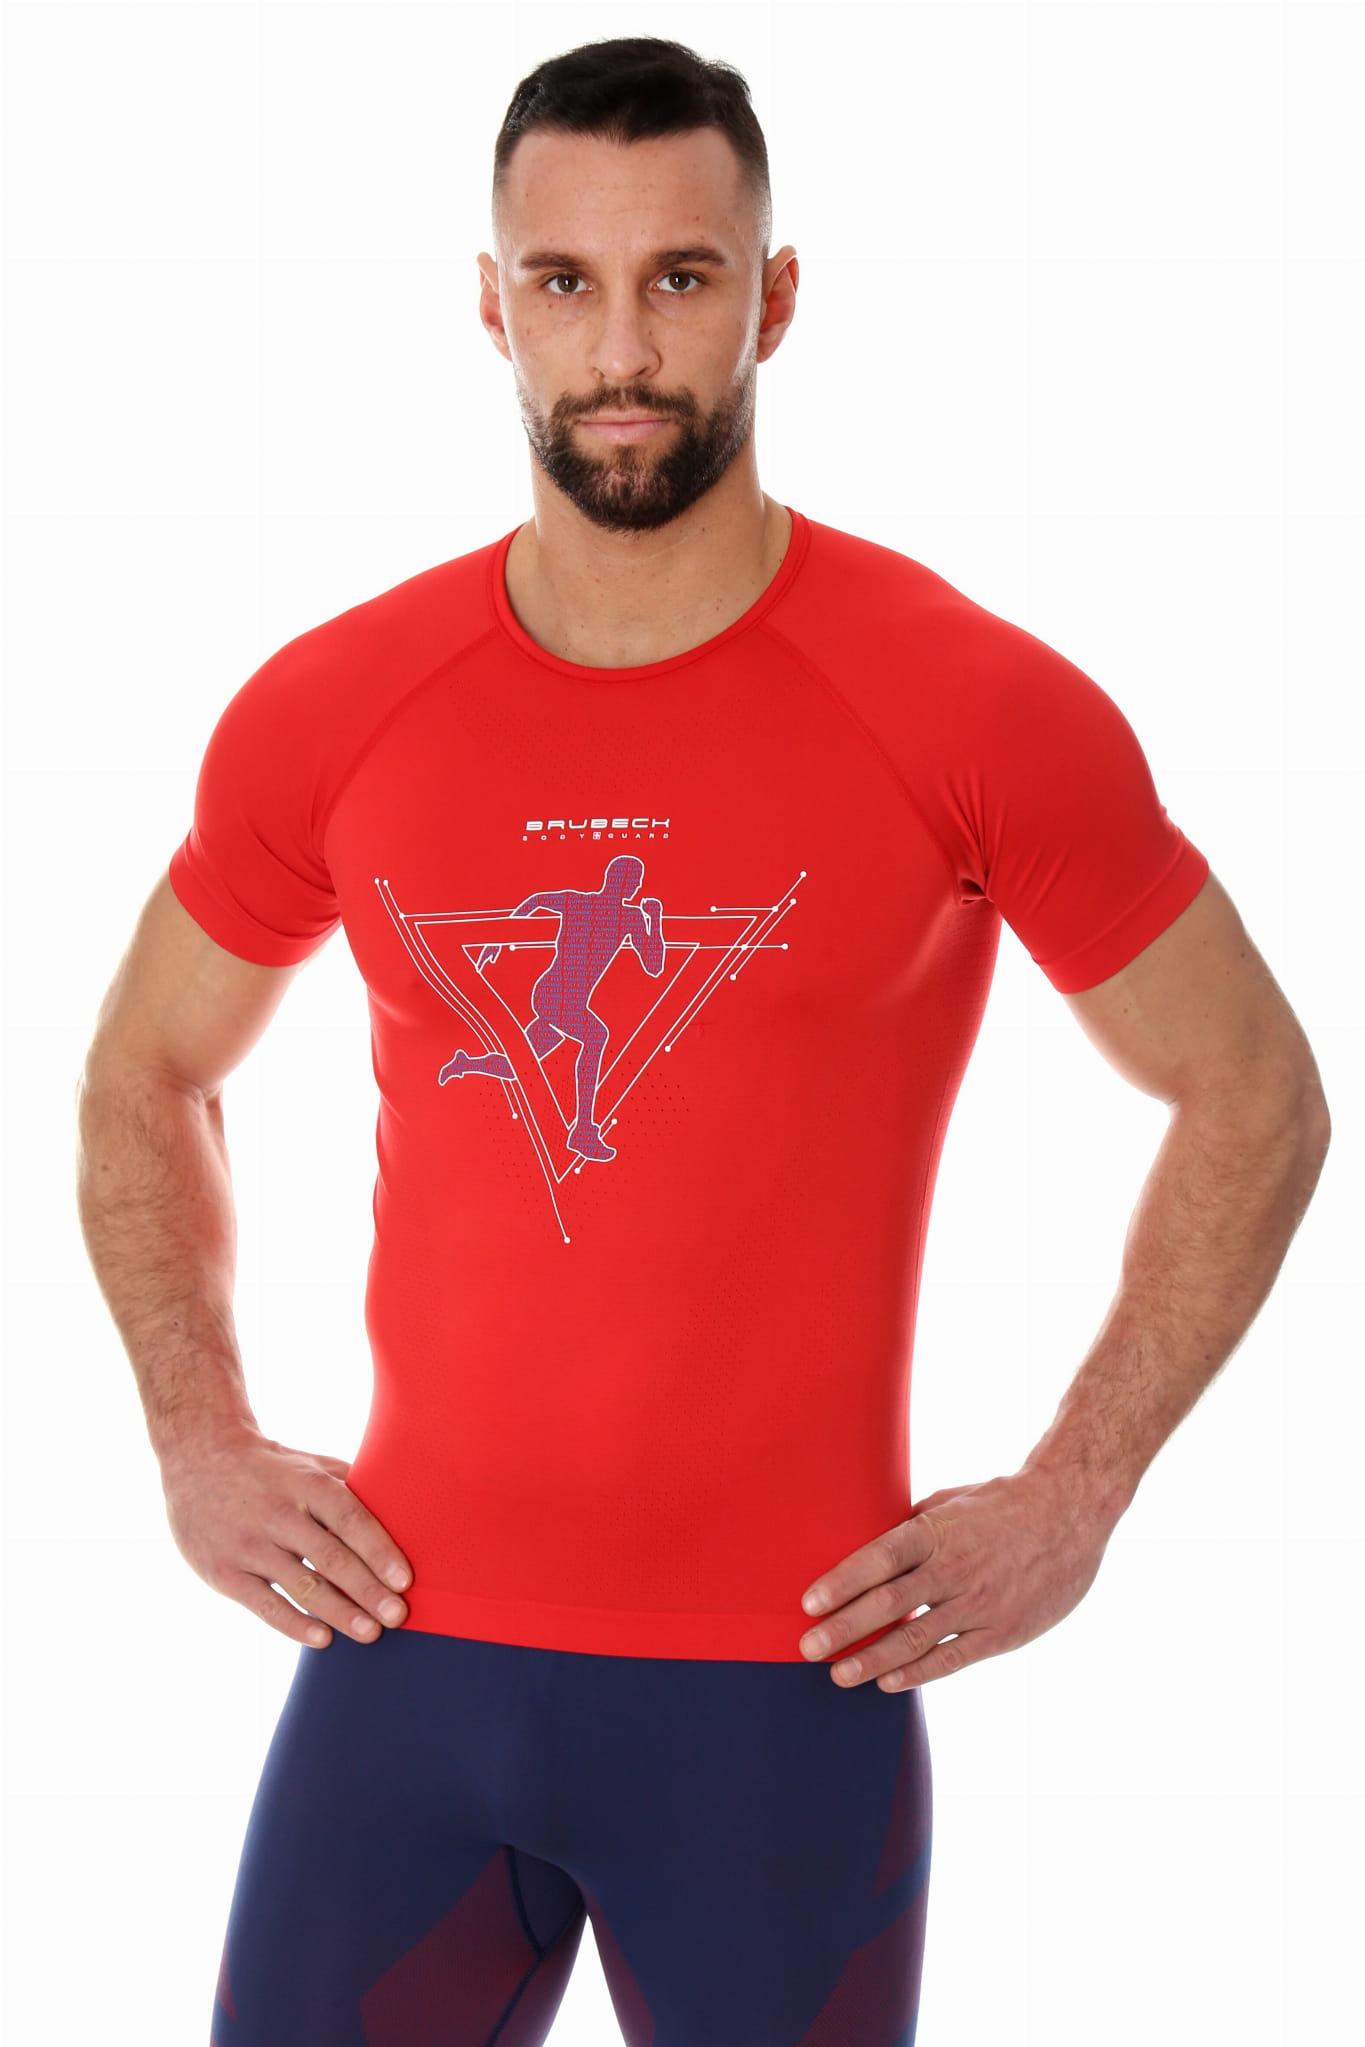 899679475c88b0 Brubeck koszulka termoaktywna męska running air pro (czerwony ...